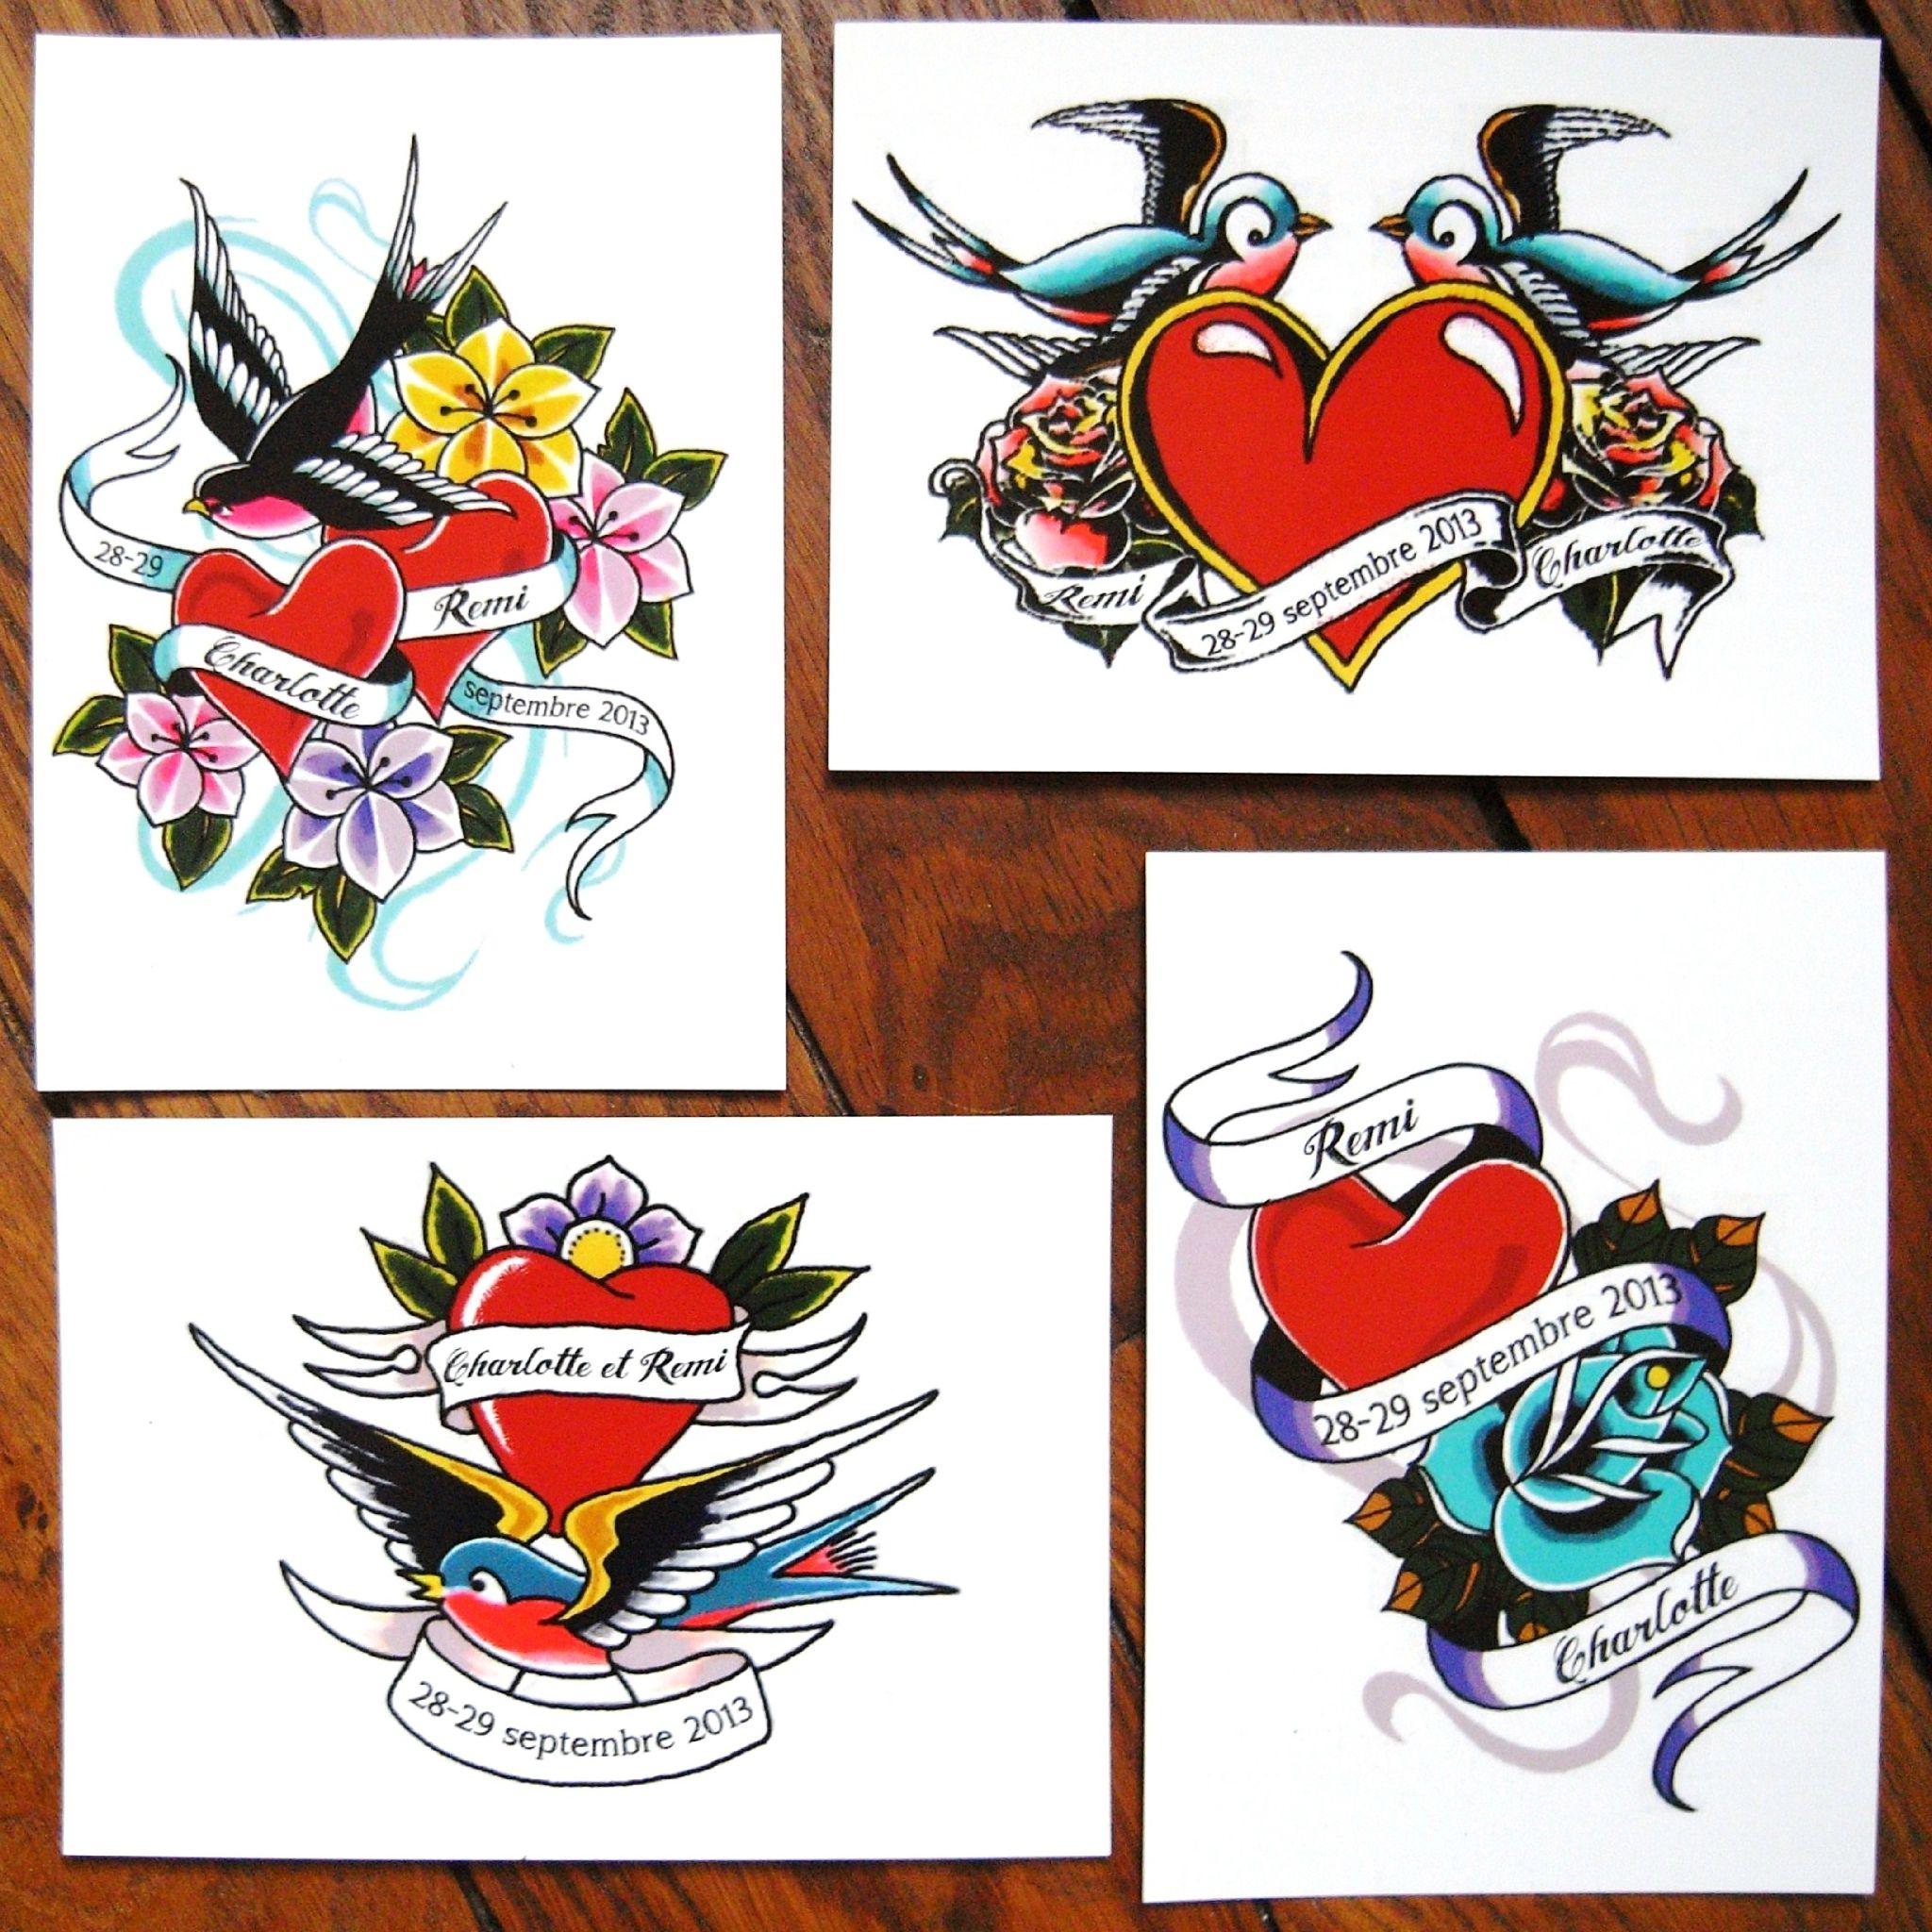 Rockabilly Wedding Ideas: Save The Date Rockabilly Tattoo